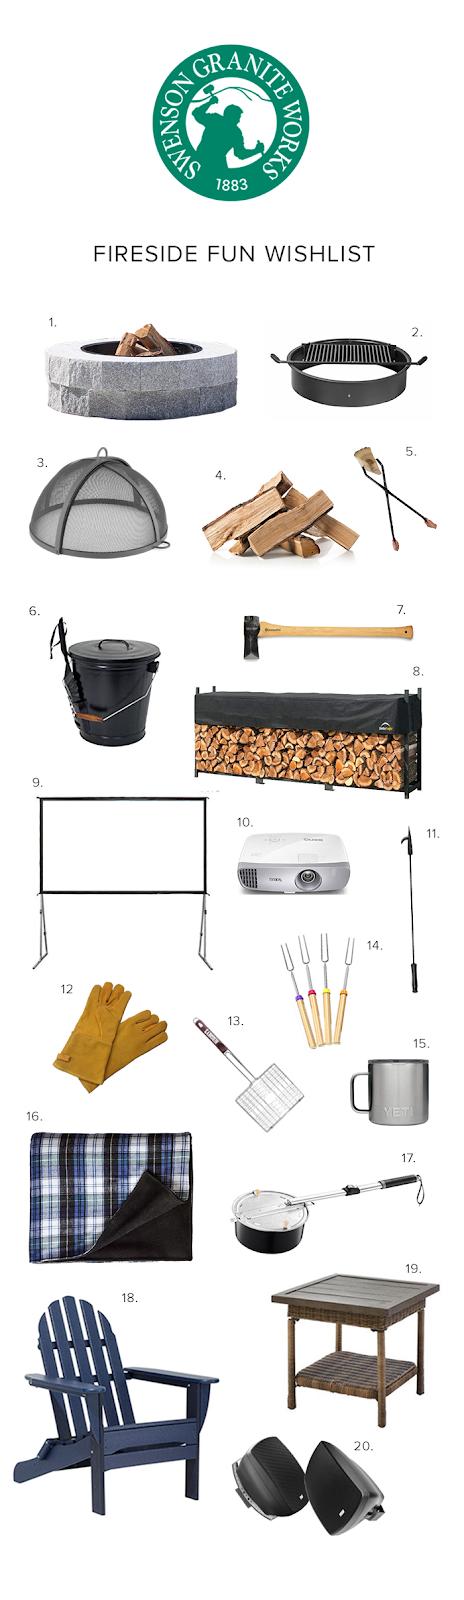 Swenson Granite Works Fireside Fun Wishlist DIY Granite Fire Pit